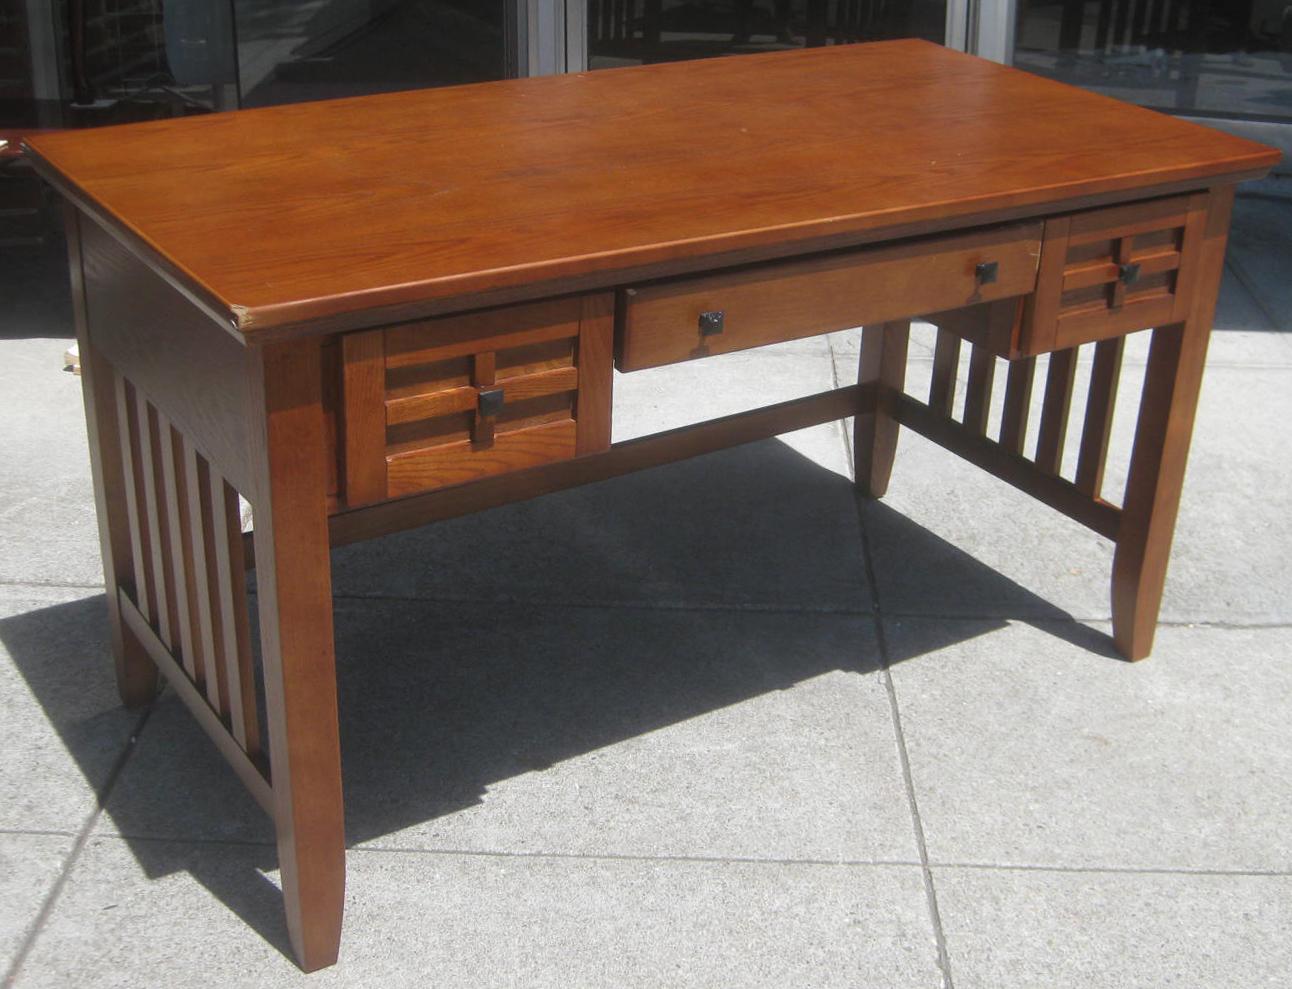 uhuru furniture collectibles sold mission computer desk 80